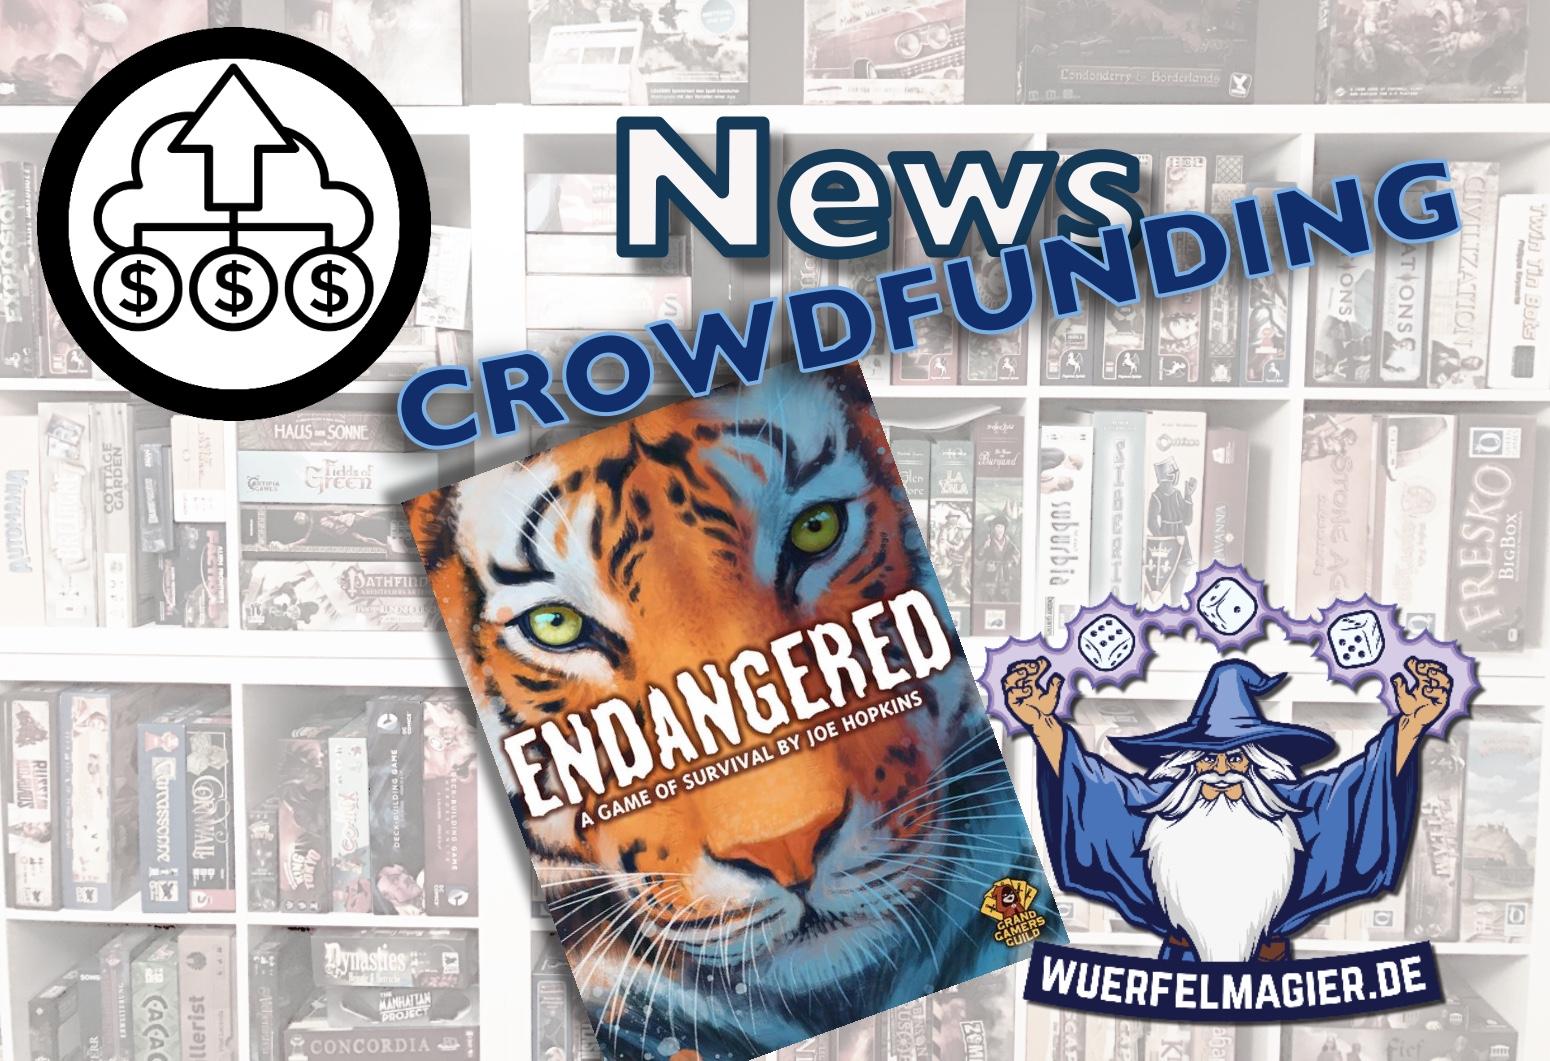 News Corwdfunding Kickstarter Endangered Wuerfelmagier Würfelmagier